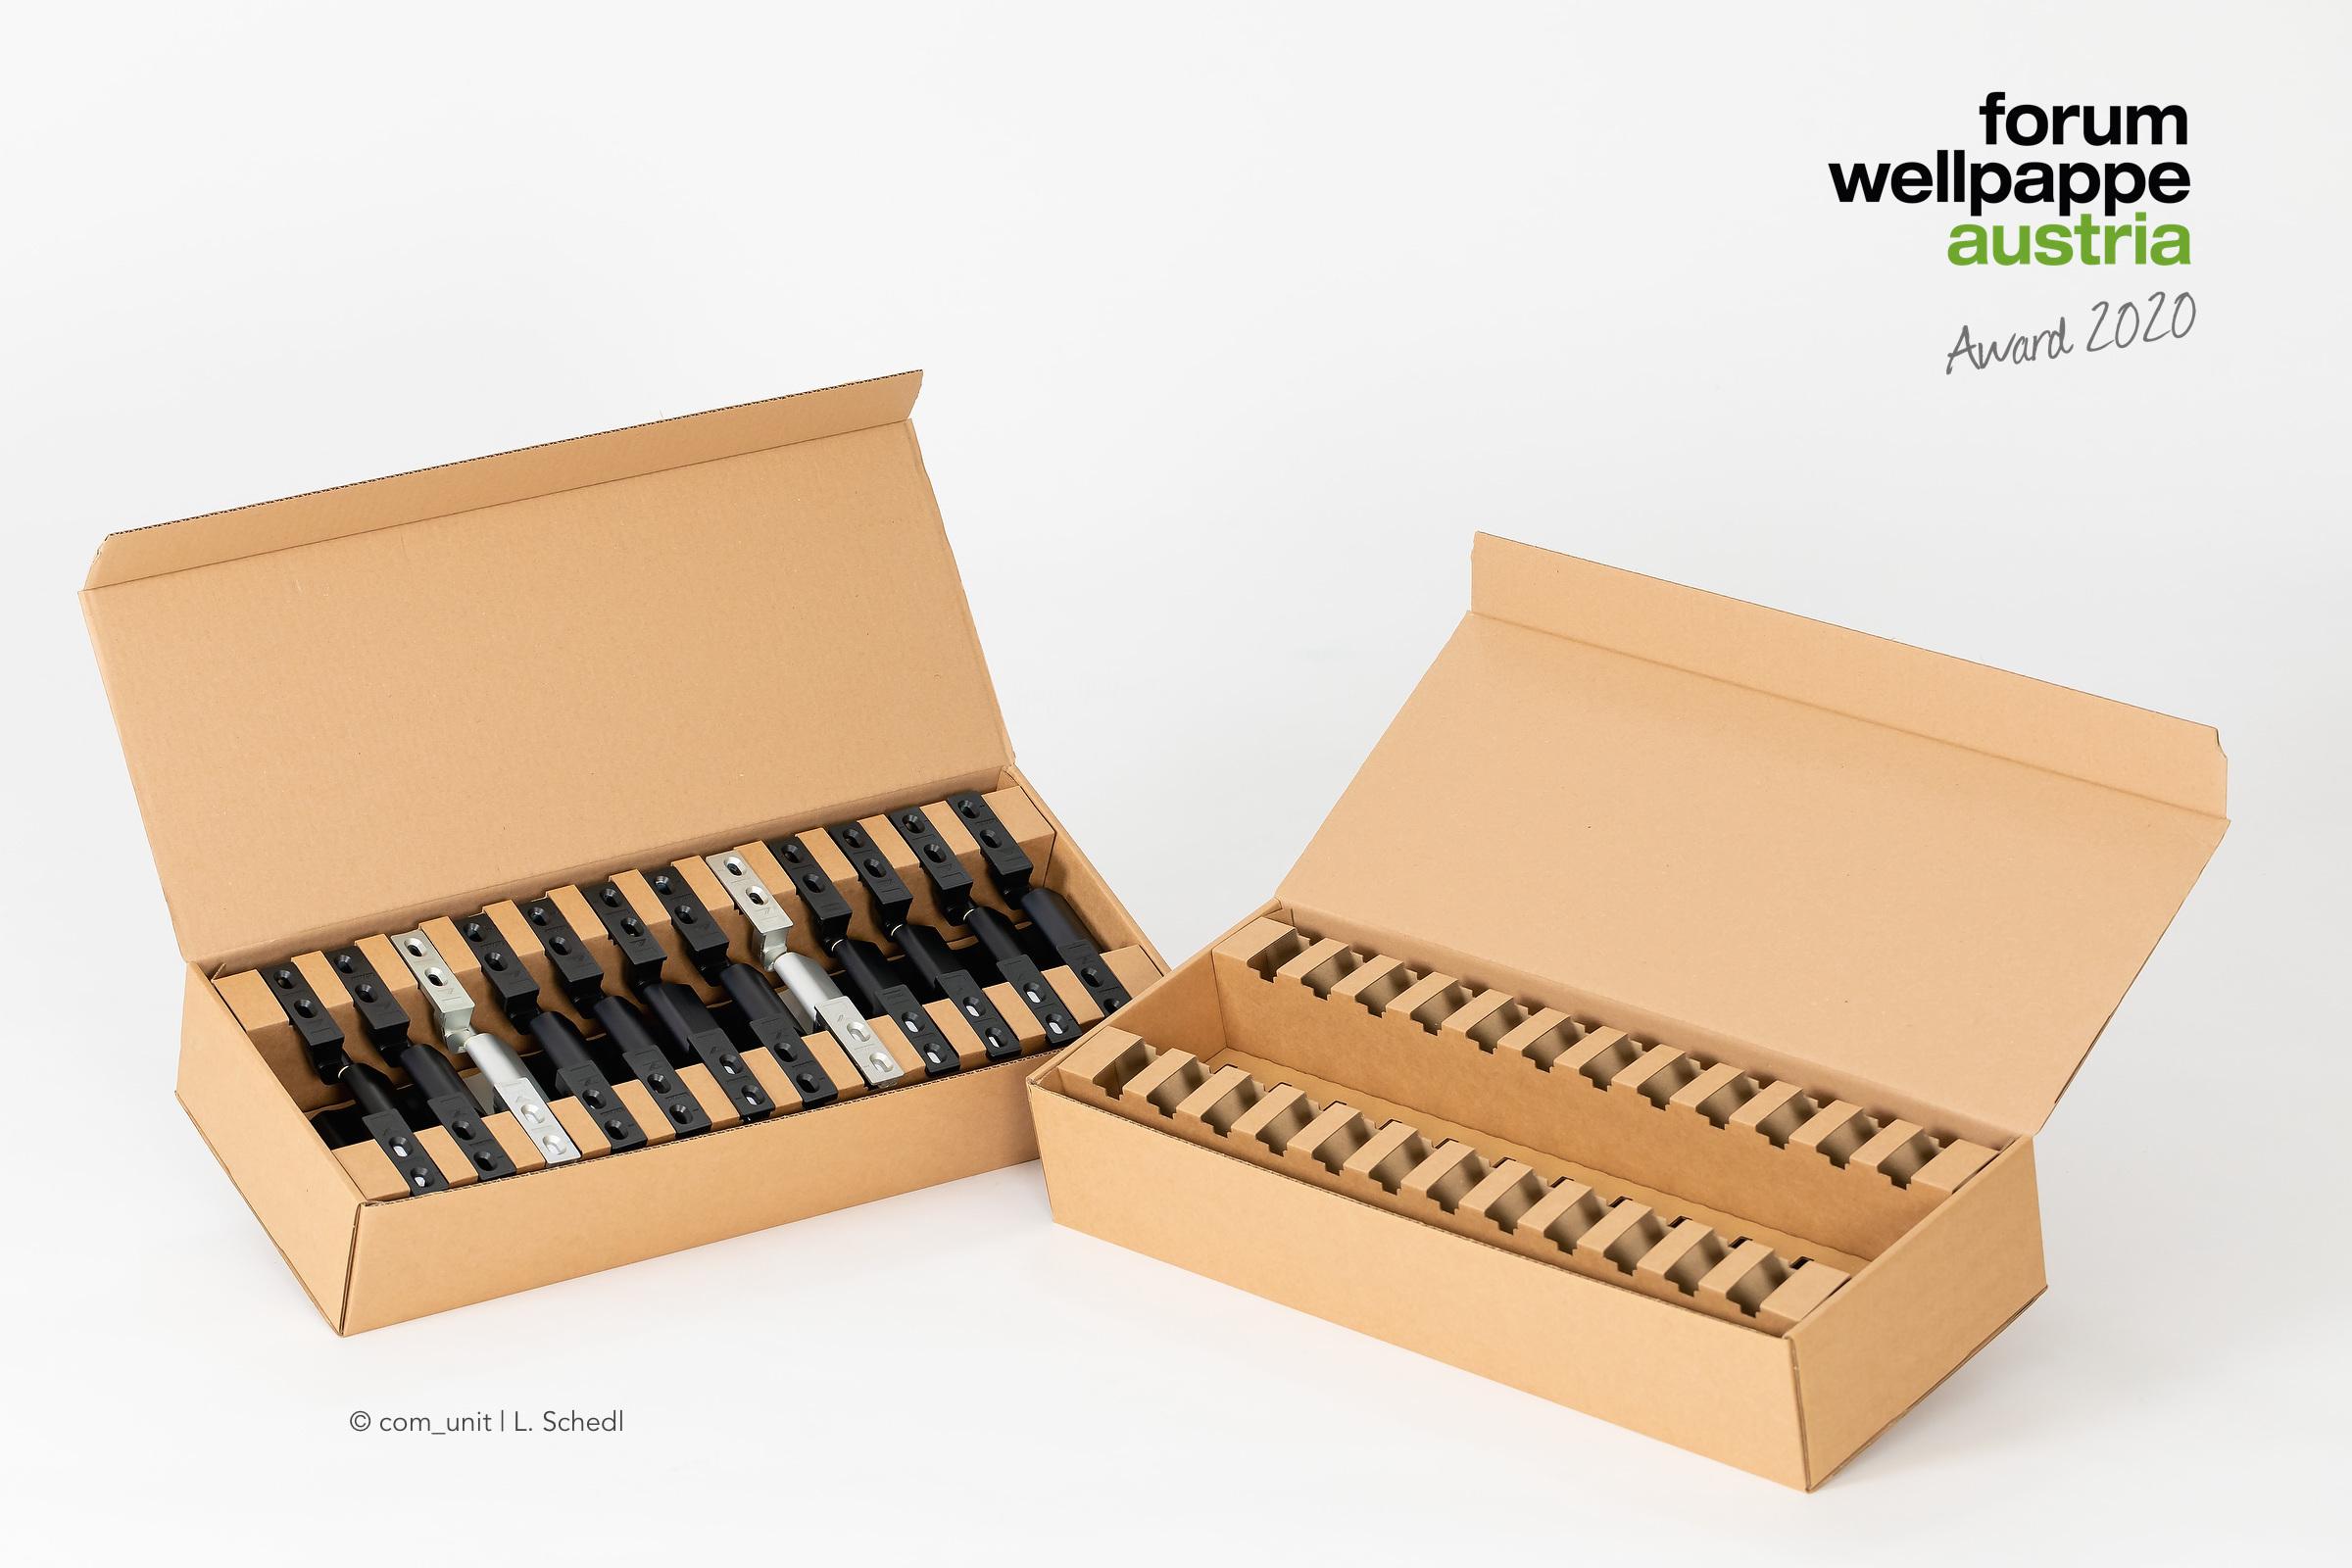 waa2020-transportbox-tuerbaender-gewinner-konstruktiv-dssmithkalsdorf-c-comunit-l.schedl